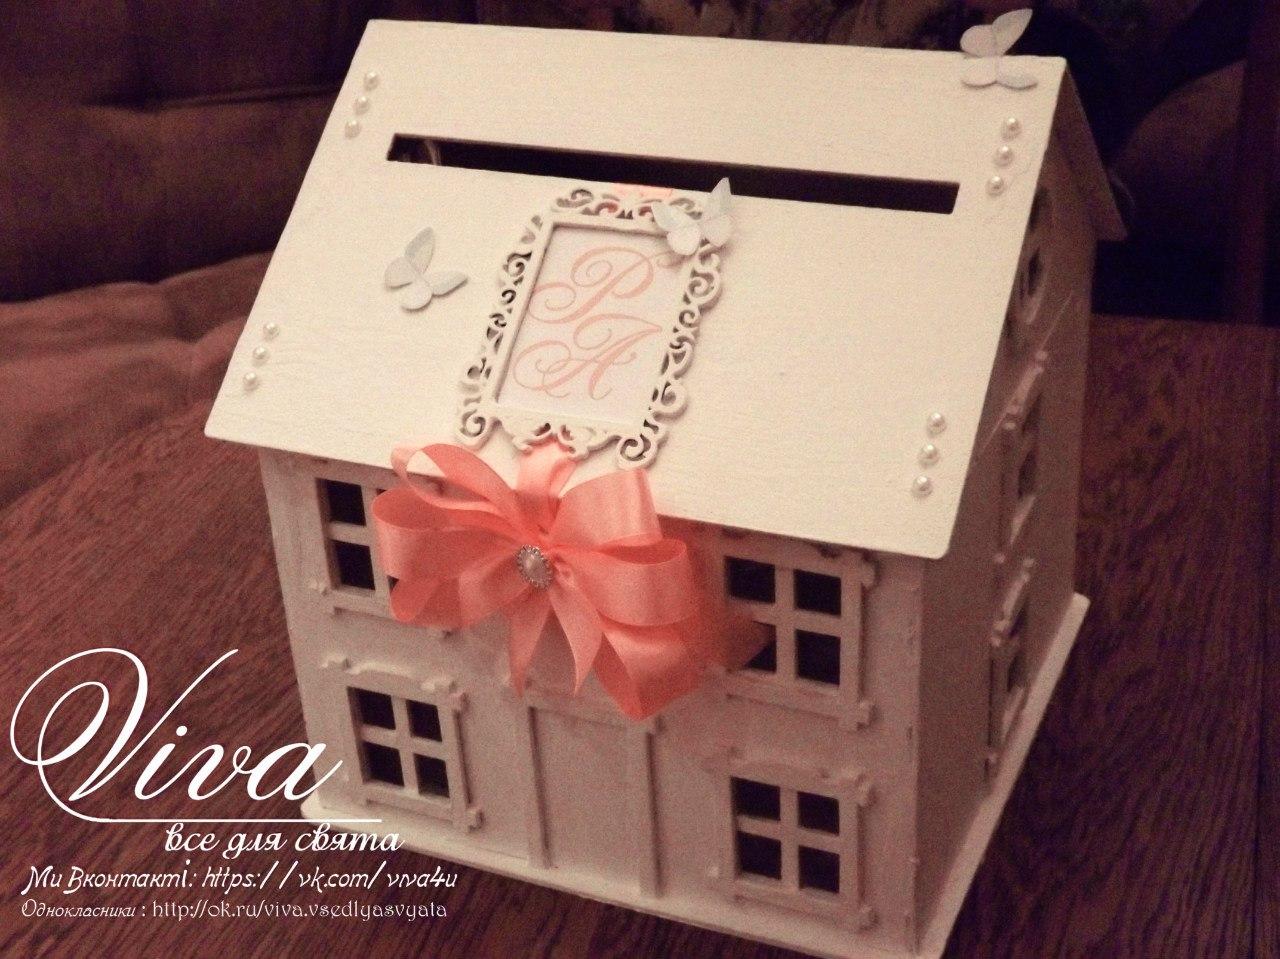 Laser Cutting Wedding Card Box File Free CDR Vectors Art